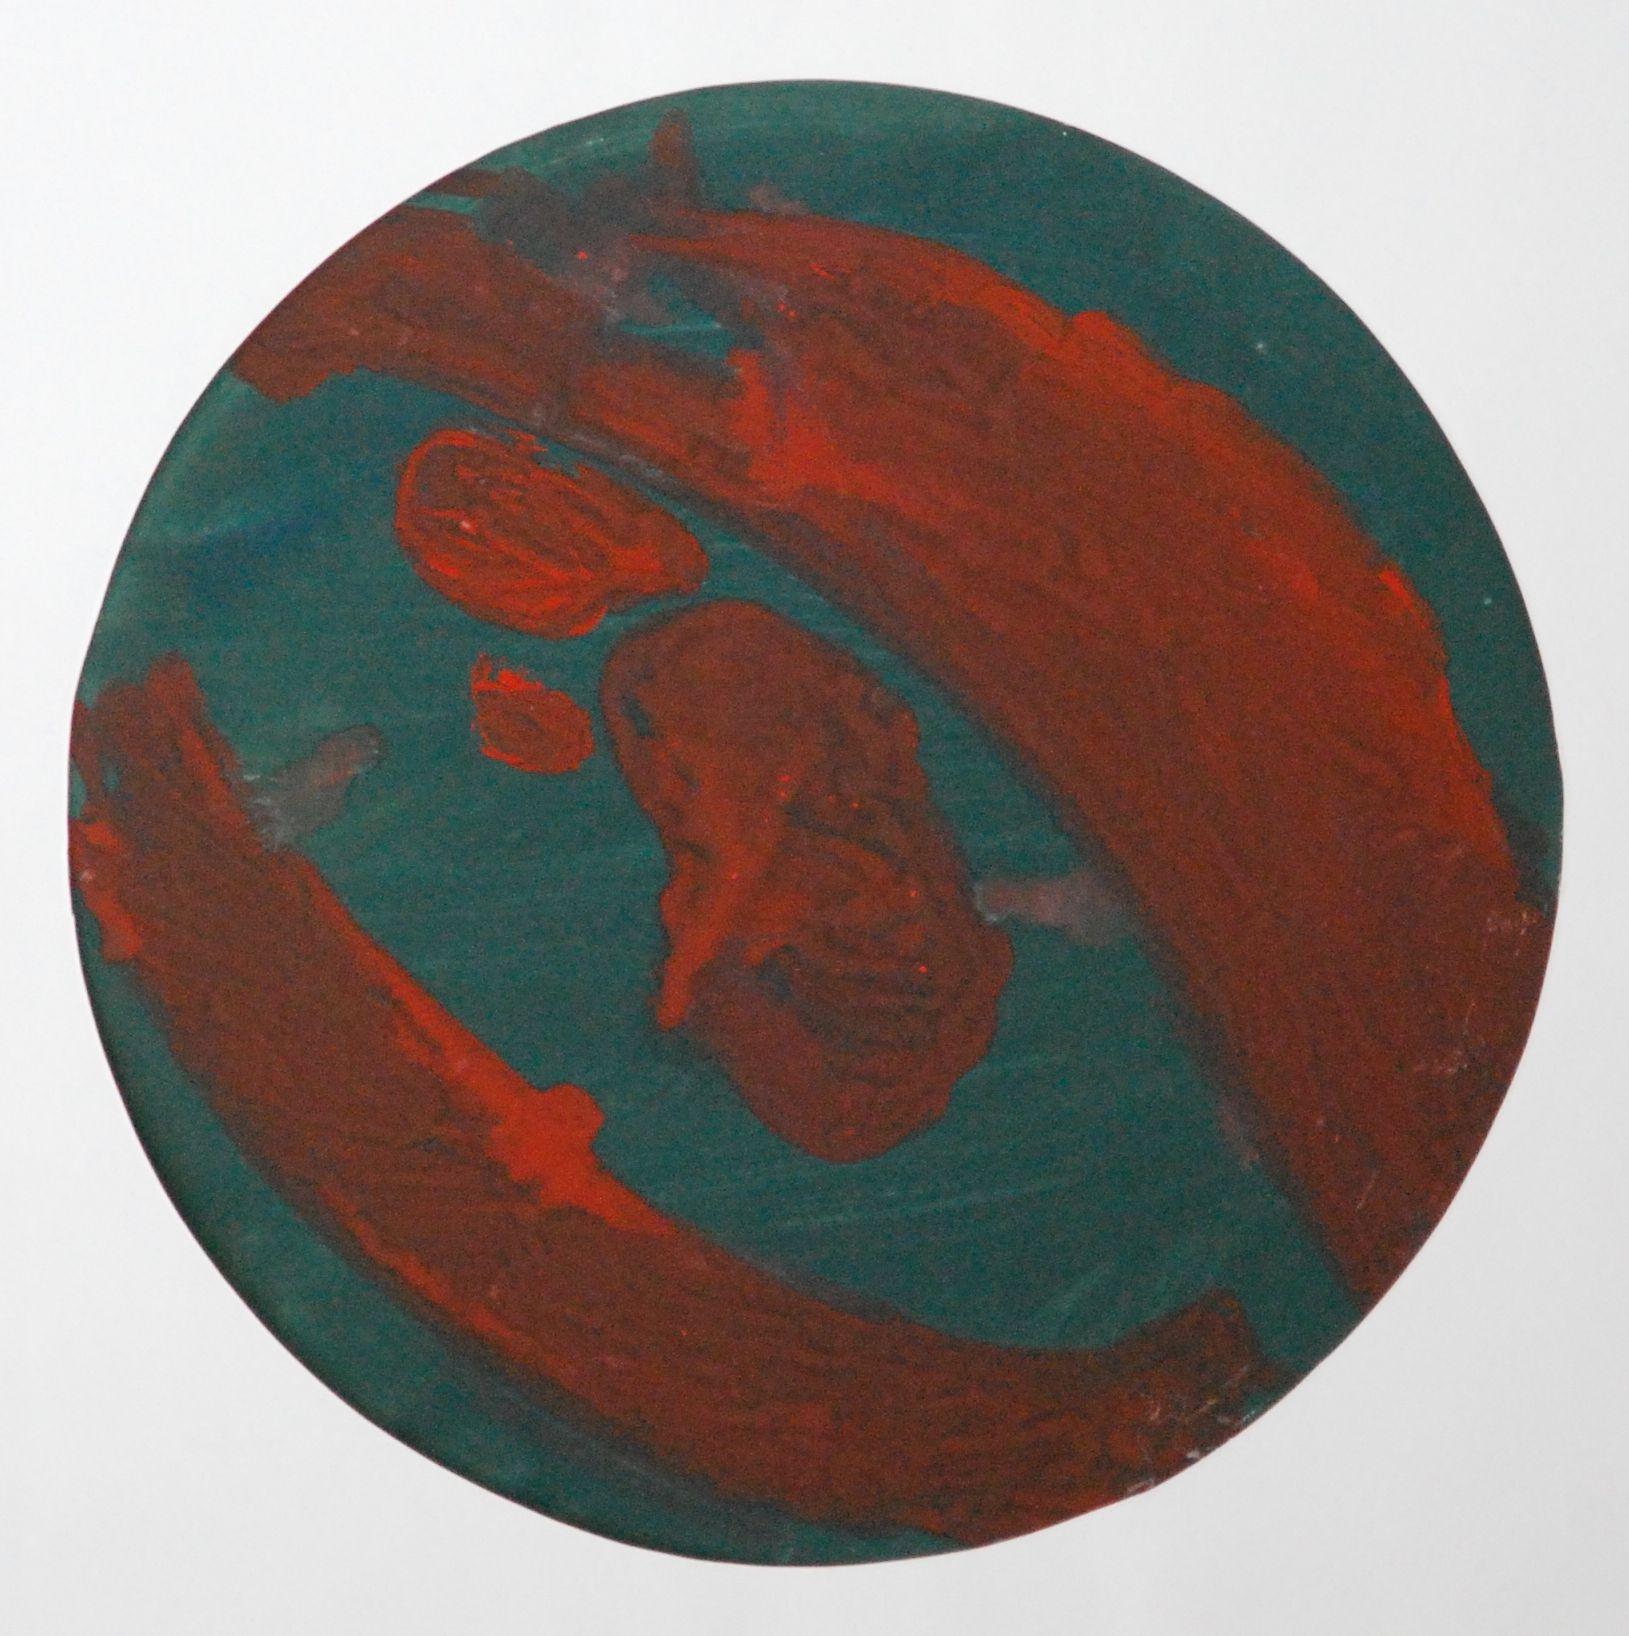 Lubomir Blecha, design for decorative glass disk, 1956, aquarelle on paper, D: 31,8 cm, UMPRUM Prague